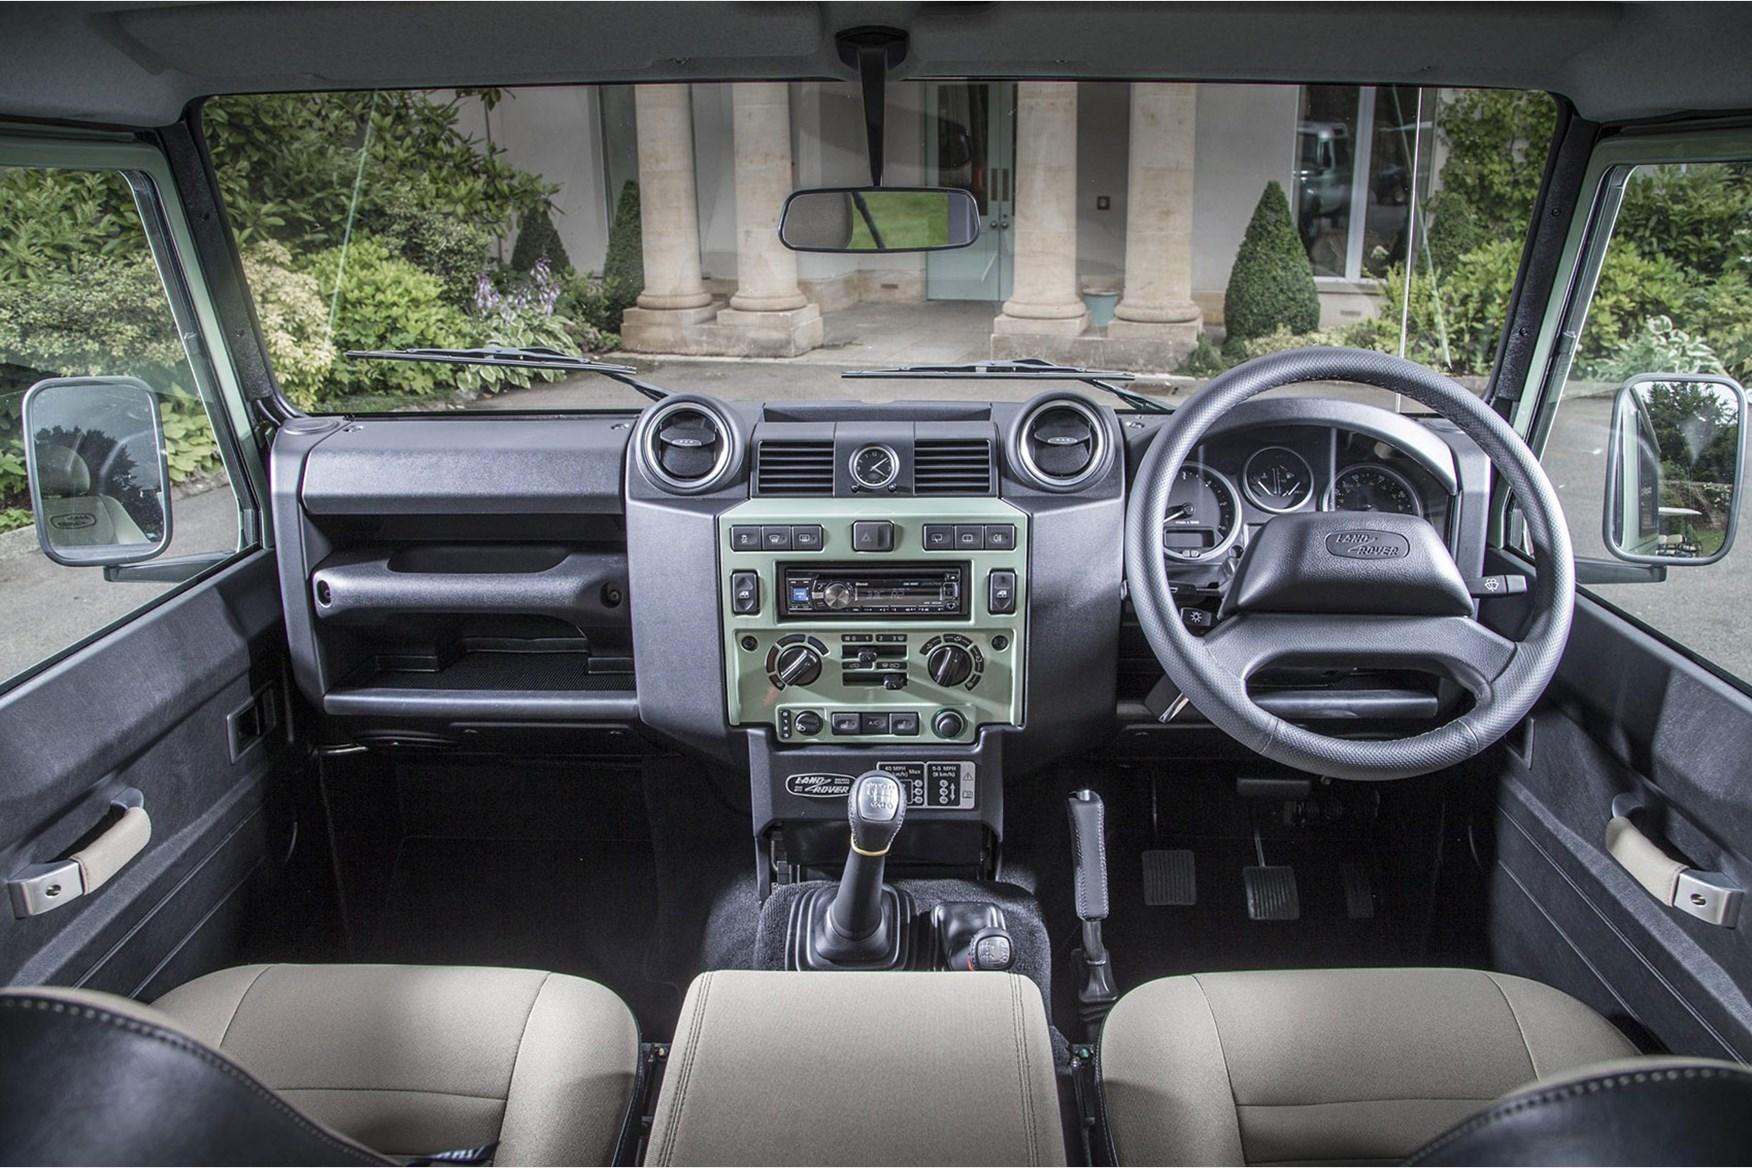 land rover defender interior. inside the land rover defender cabin ergonomics not included interior